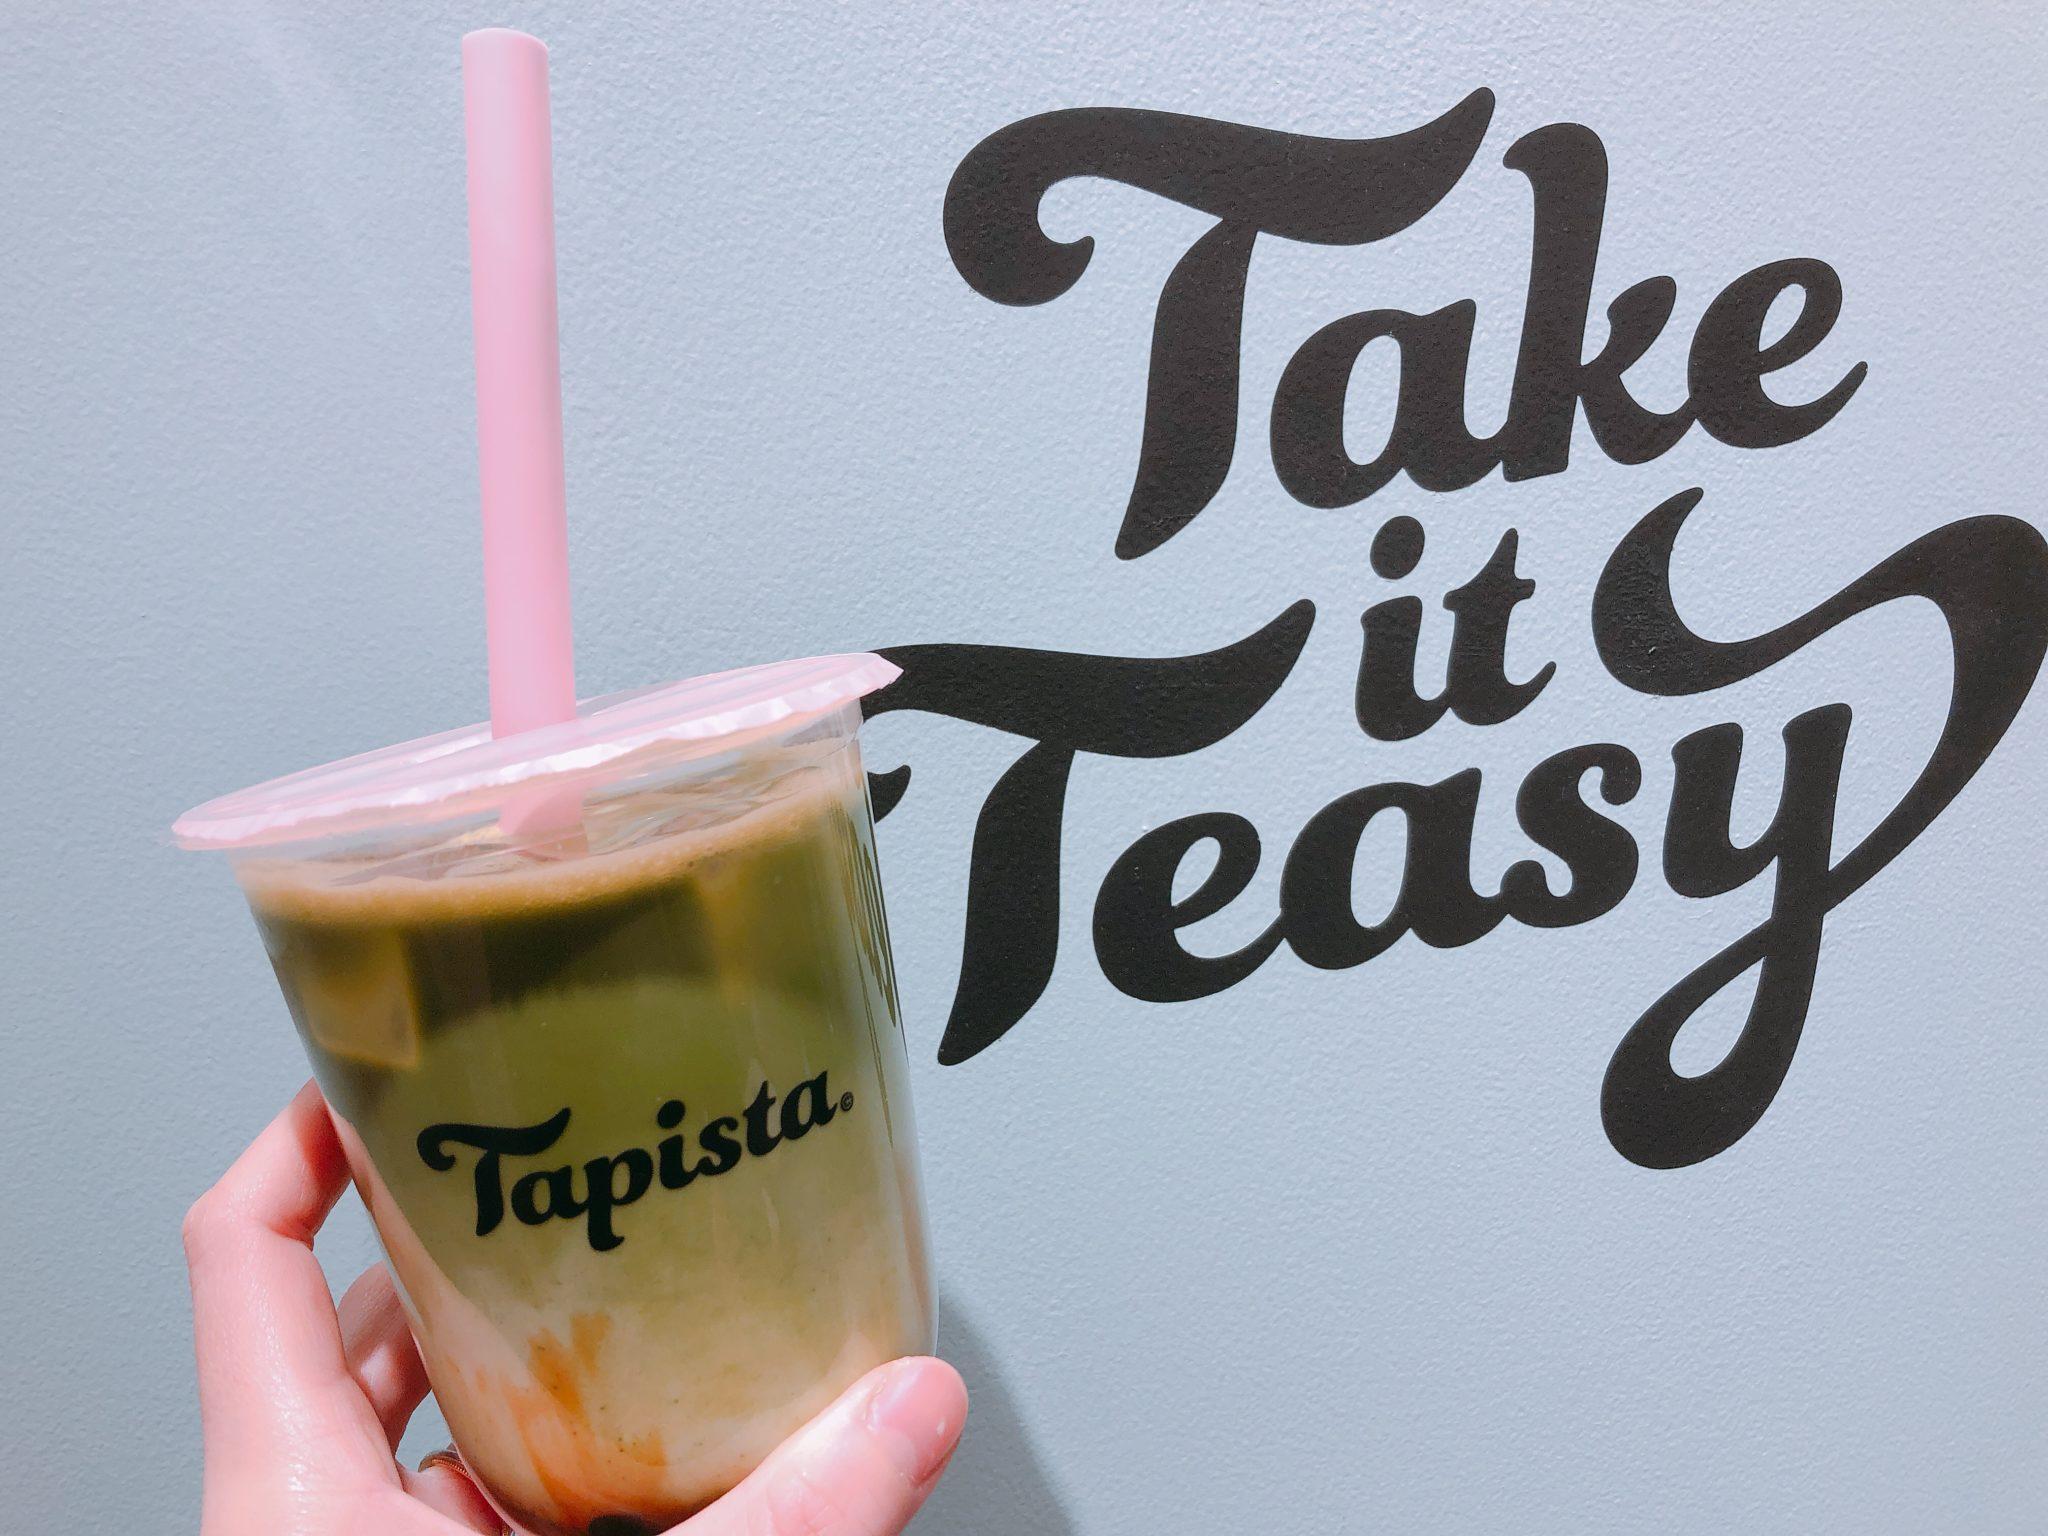 TAPISTA(タピスタ)の宇治抹茶ラテ